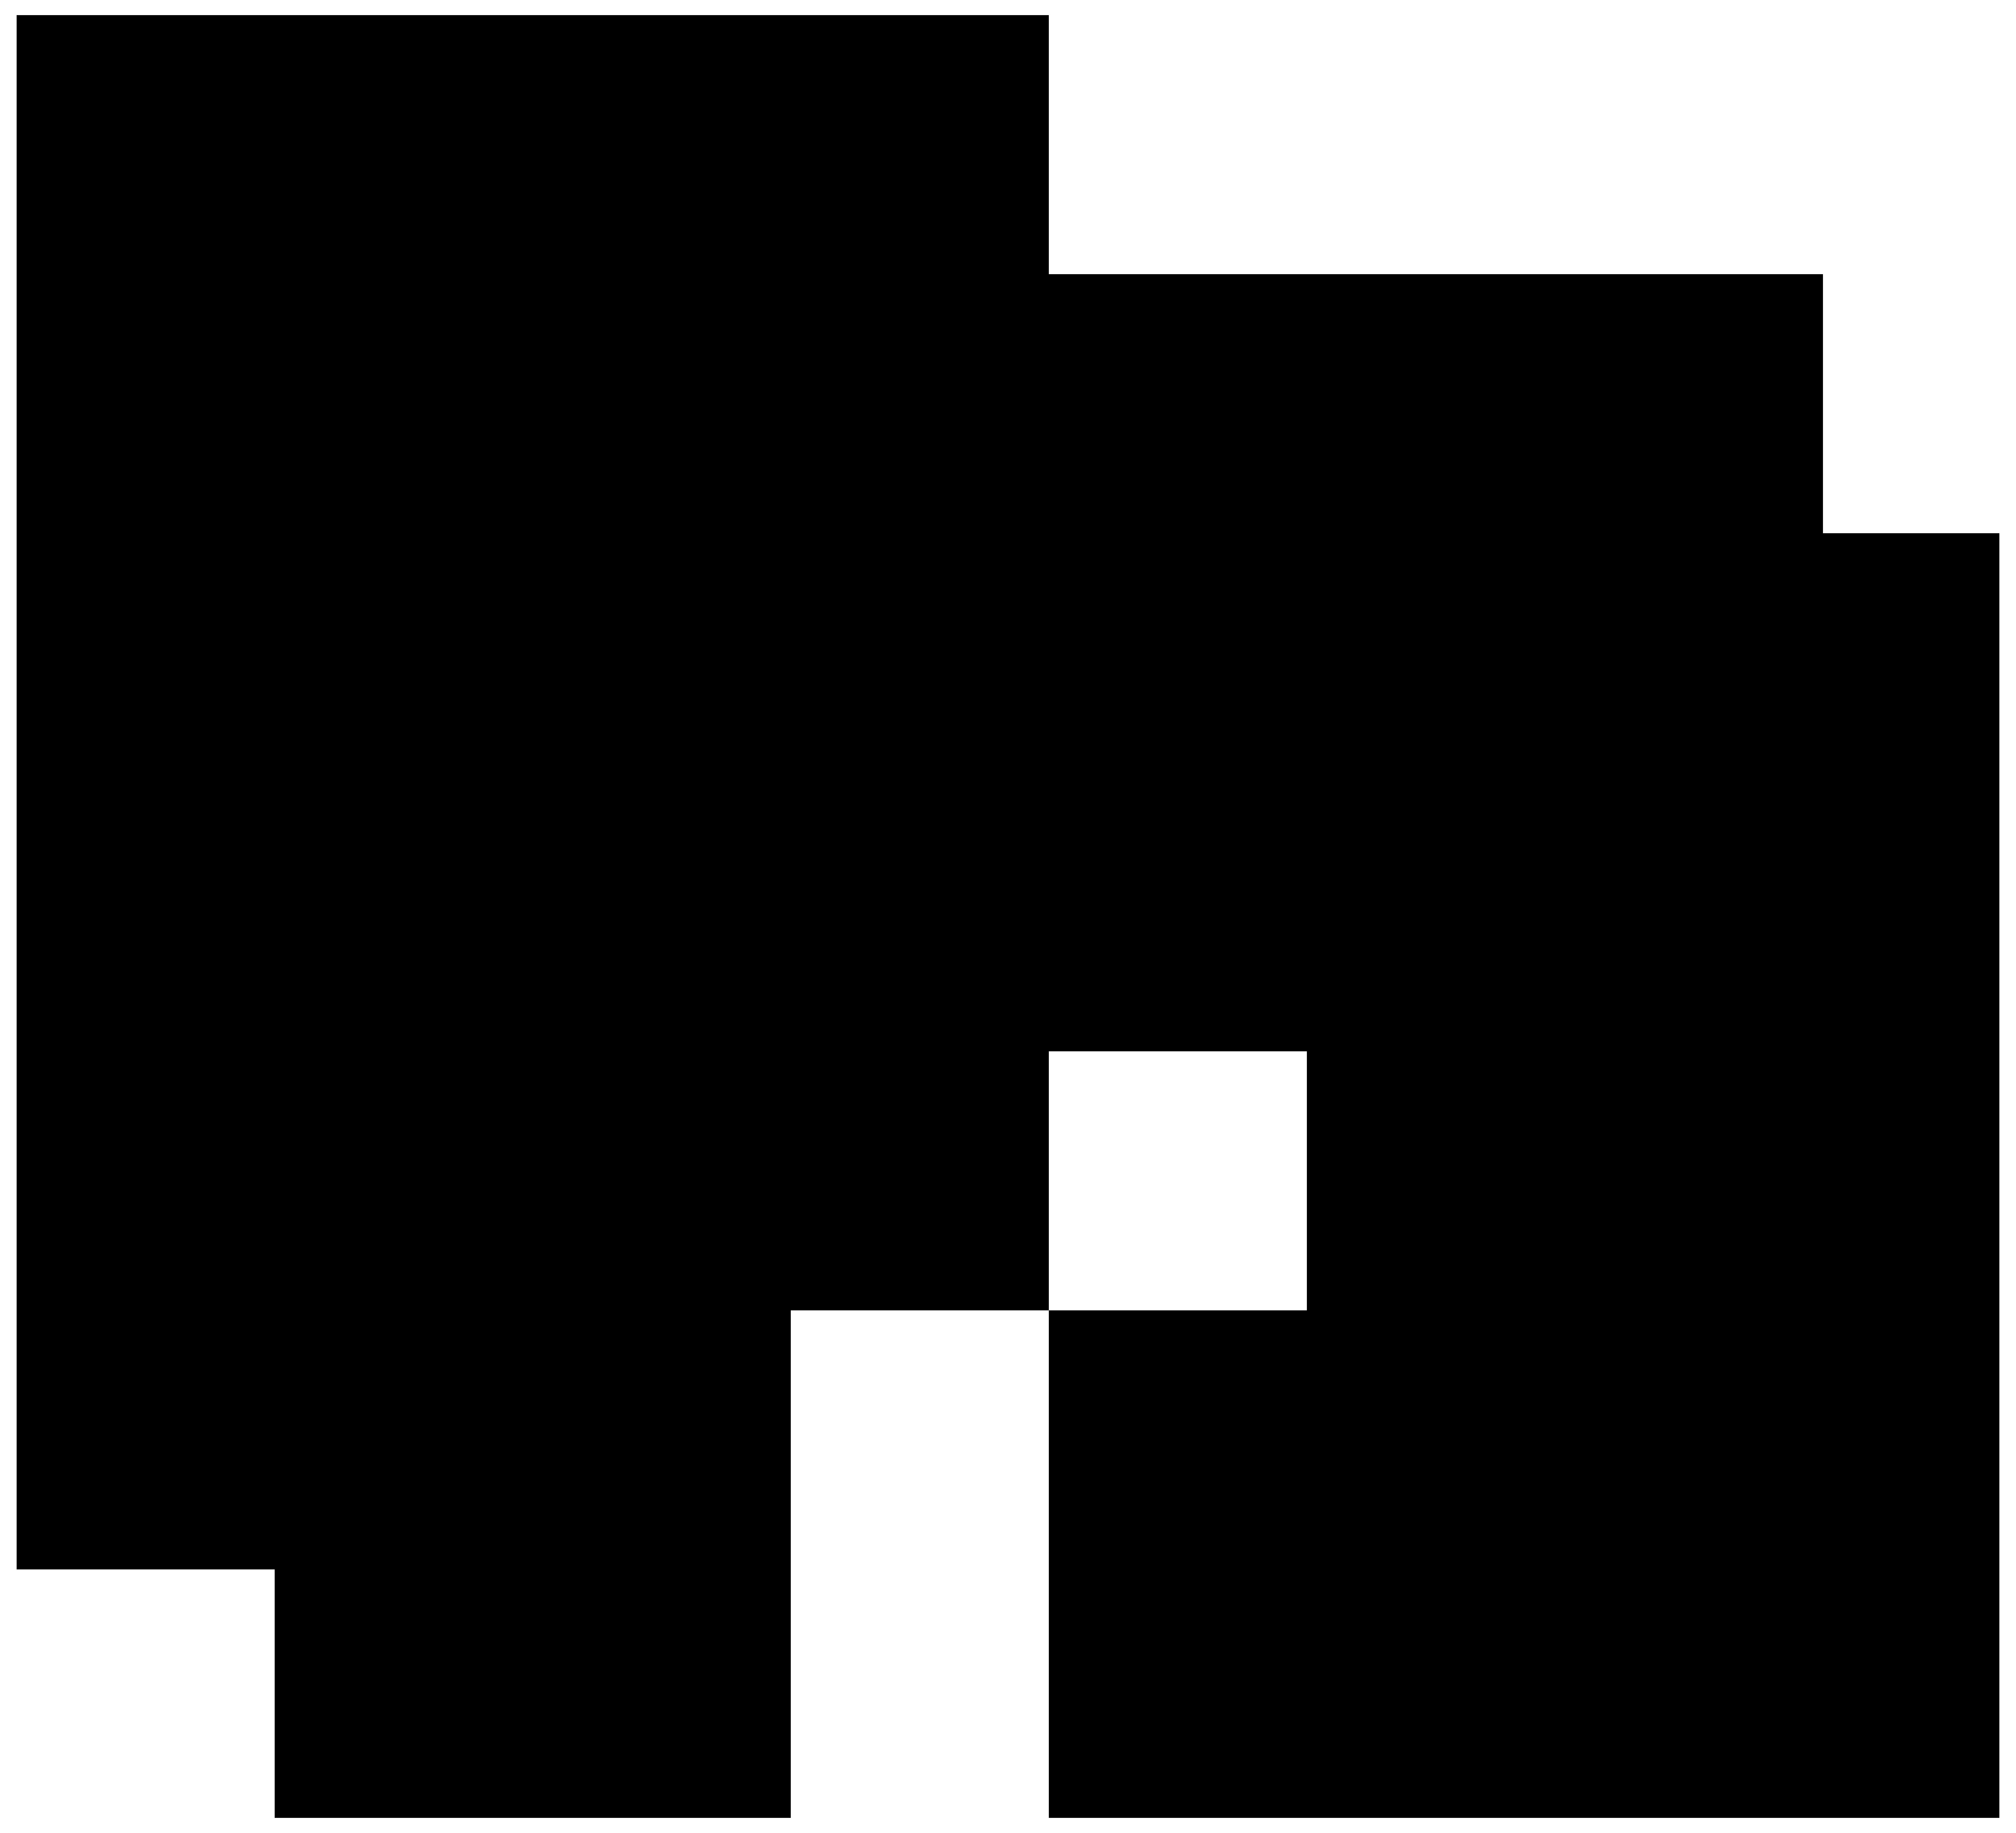 svg free download Horse Silhouette Transparent PNG Clip Art Image